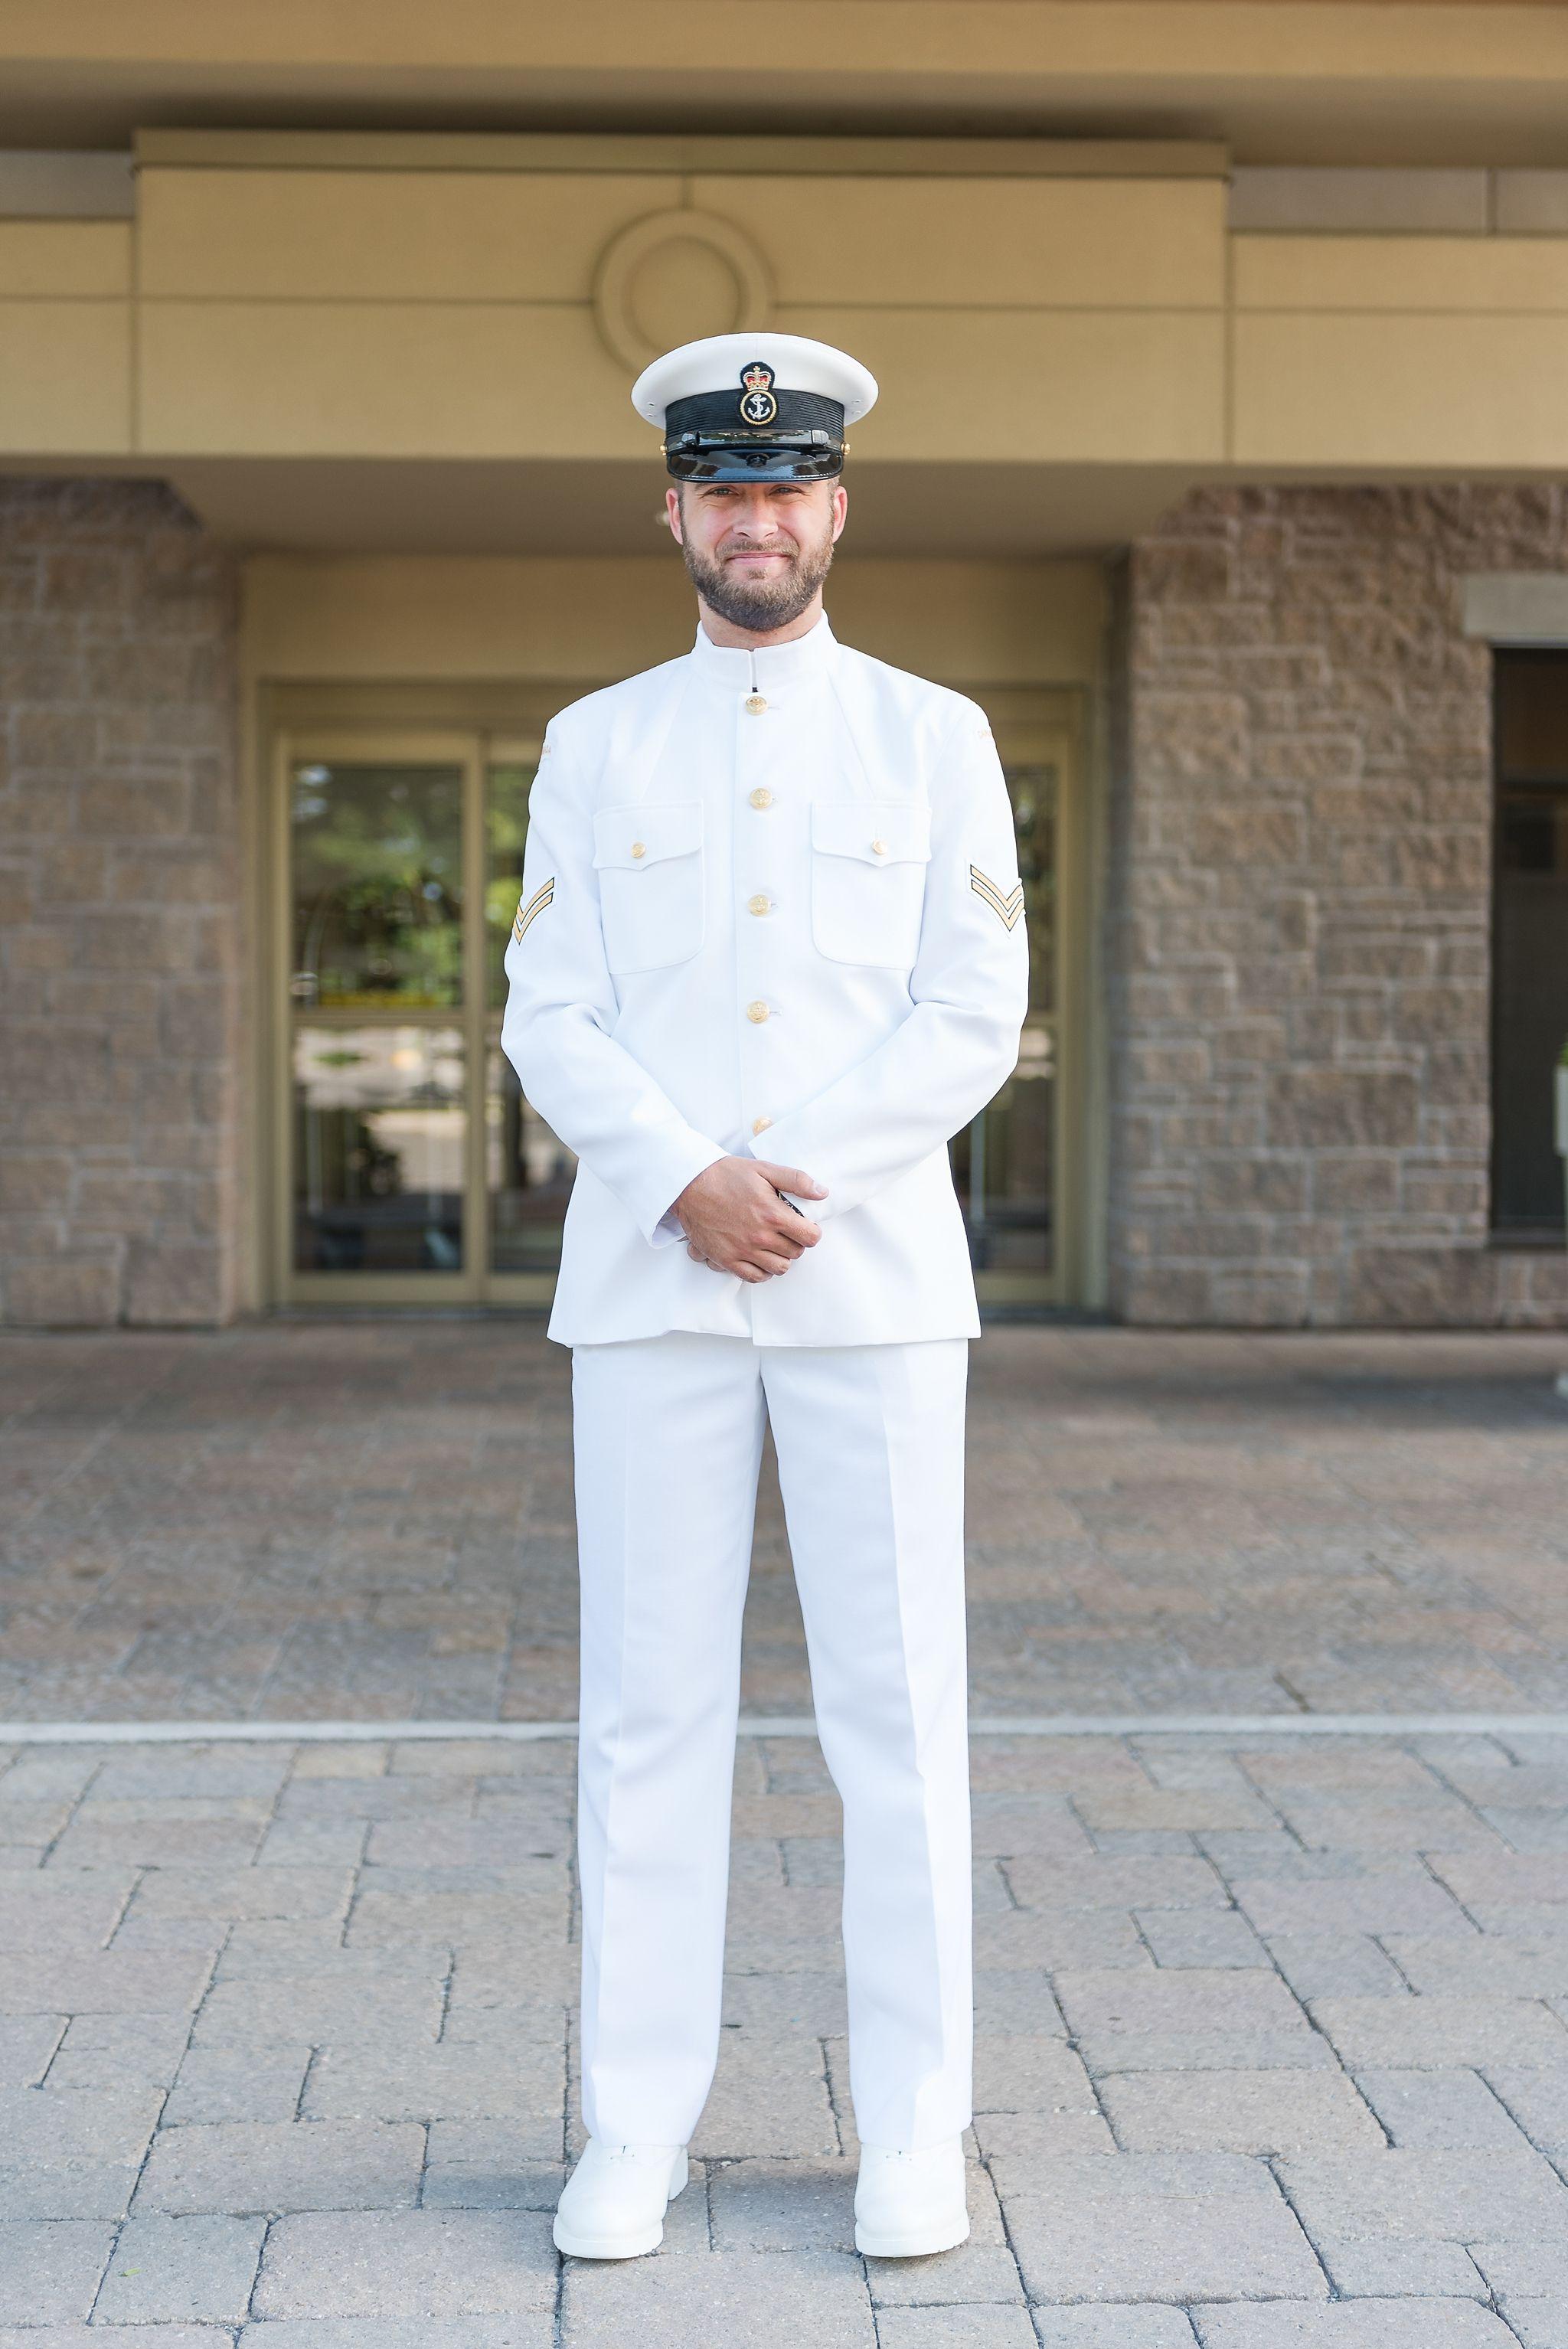 Stonebridge Golf Club Wedding Amanda Steve Navy White Uniform Royal Canadian Navy Golf Club Wedding